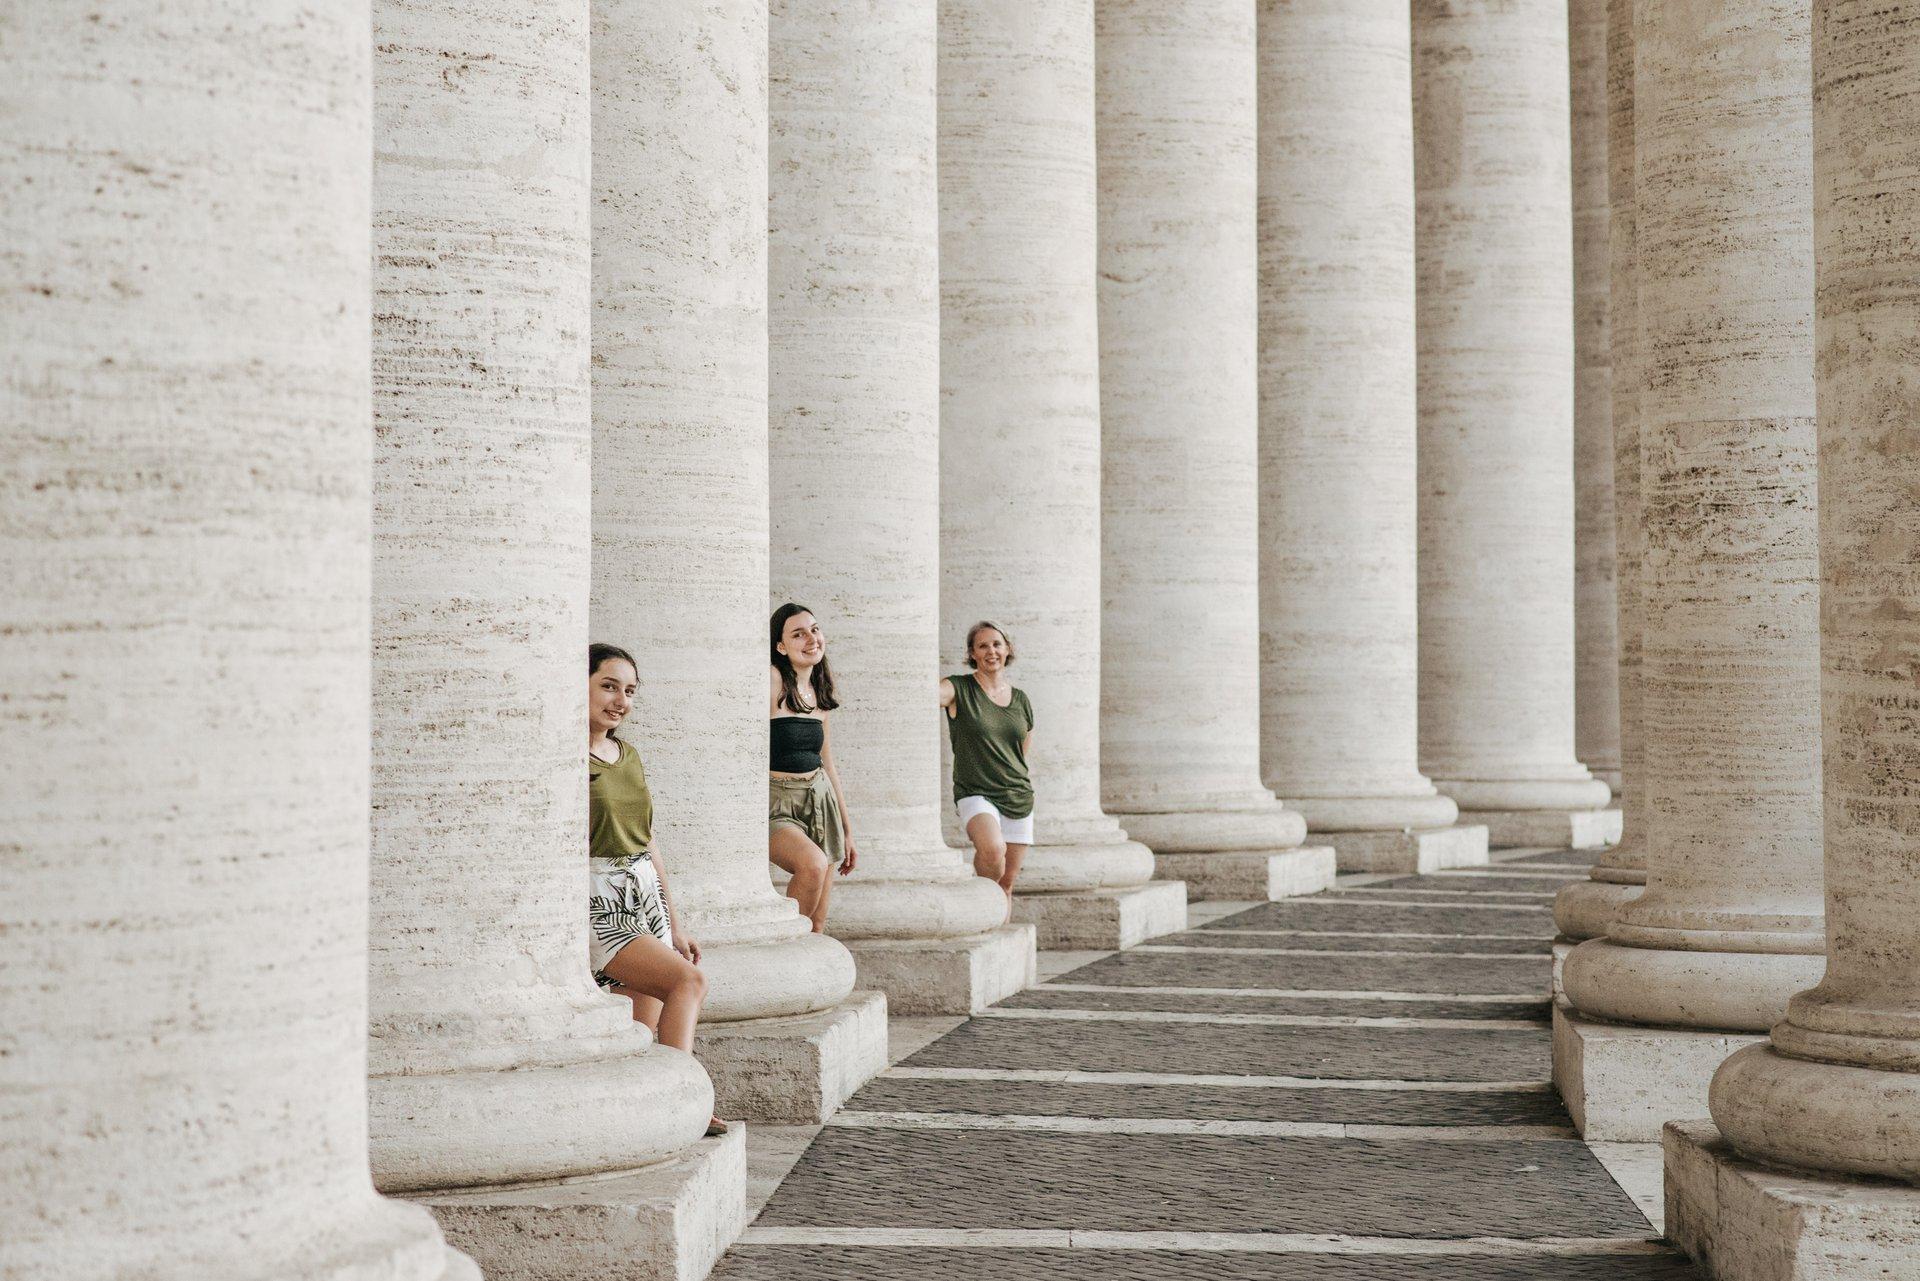 Rome-Italy-travel-story-Flytographer-7